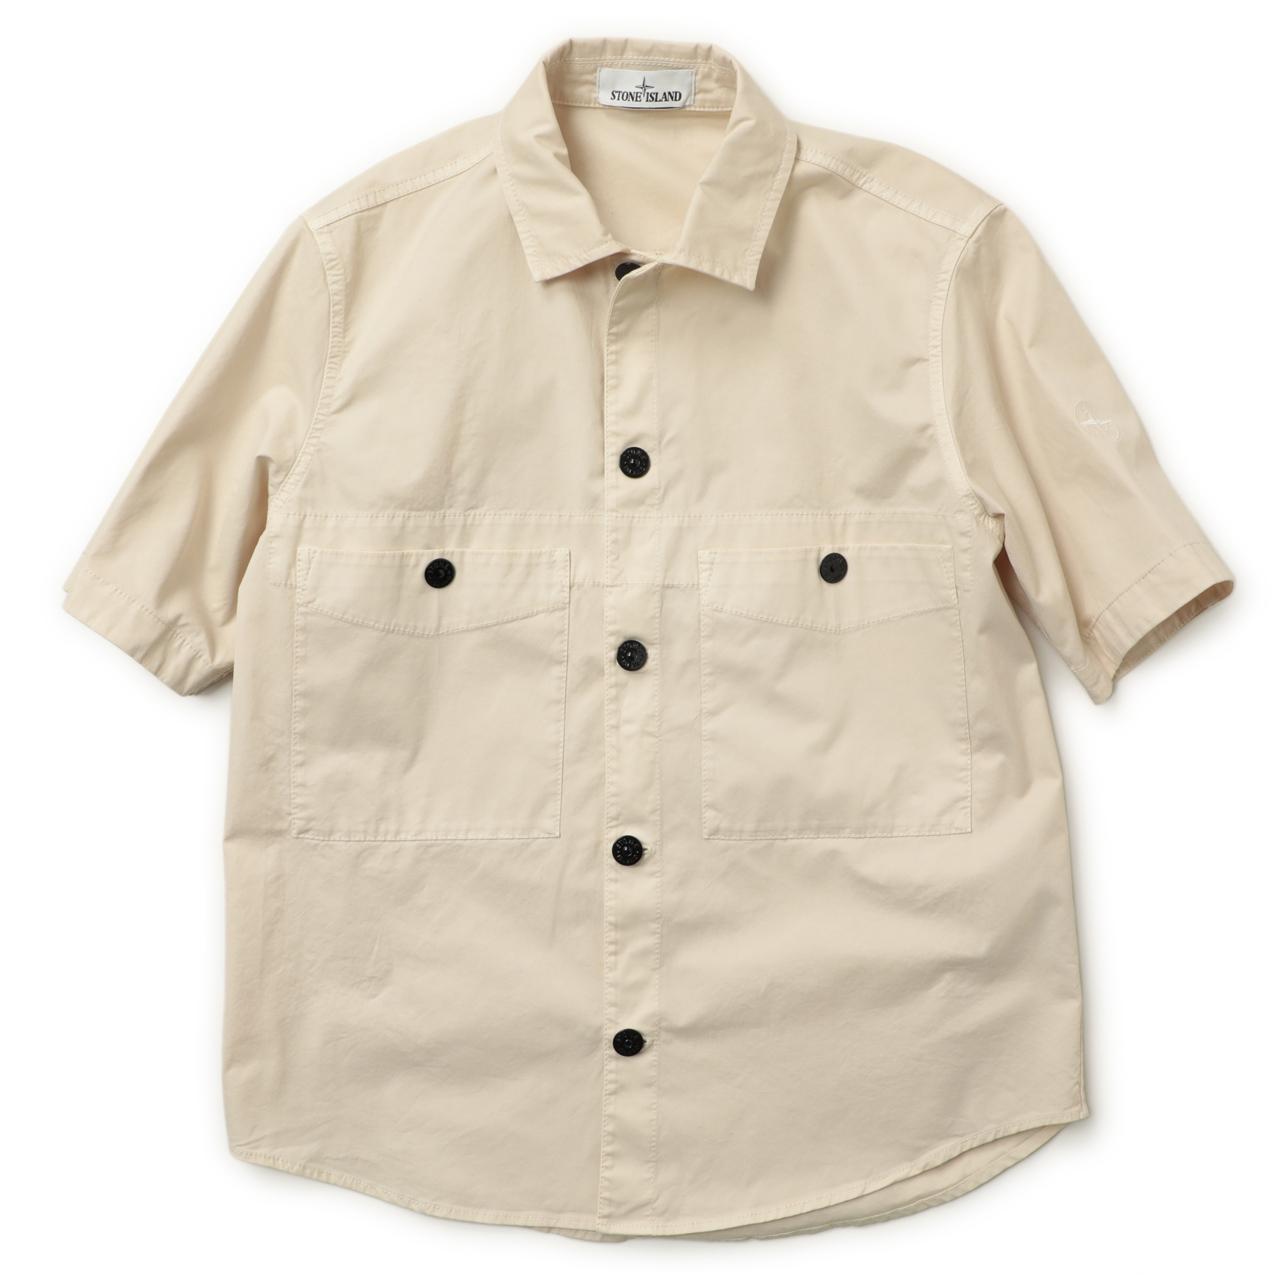 STONE ISLAND ストーンアイランド オーバーシャツ 半袖 ガーメントダイ コットン ストレッチ 741511819